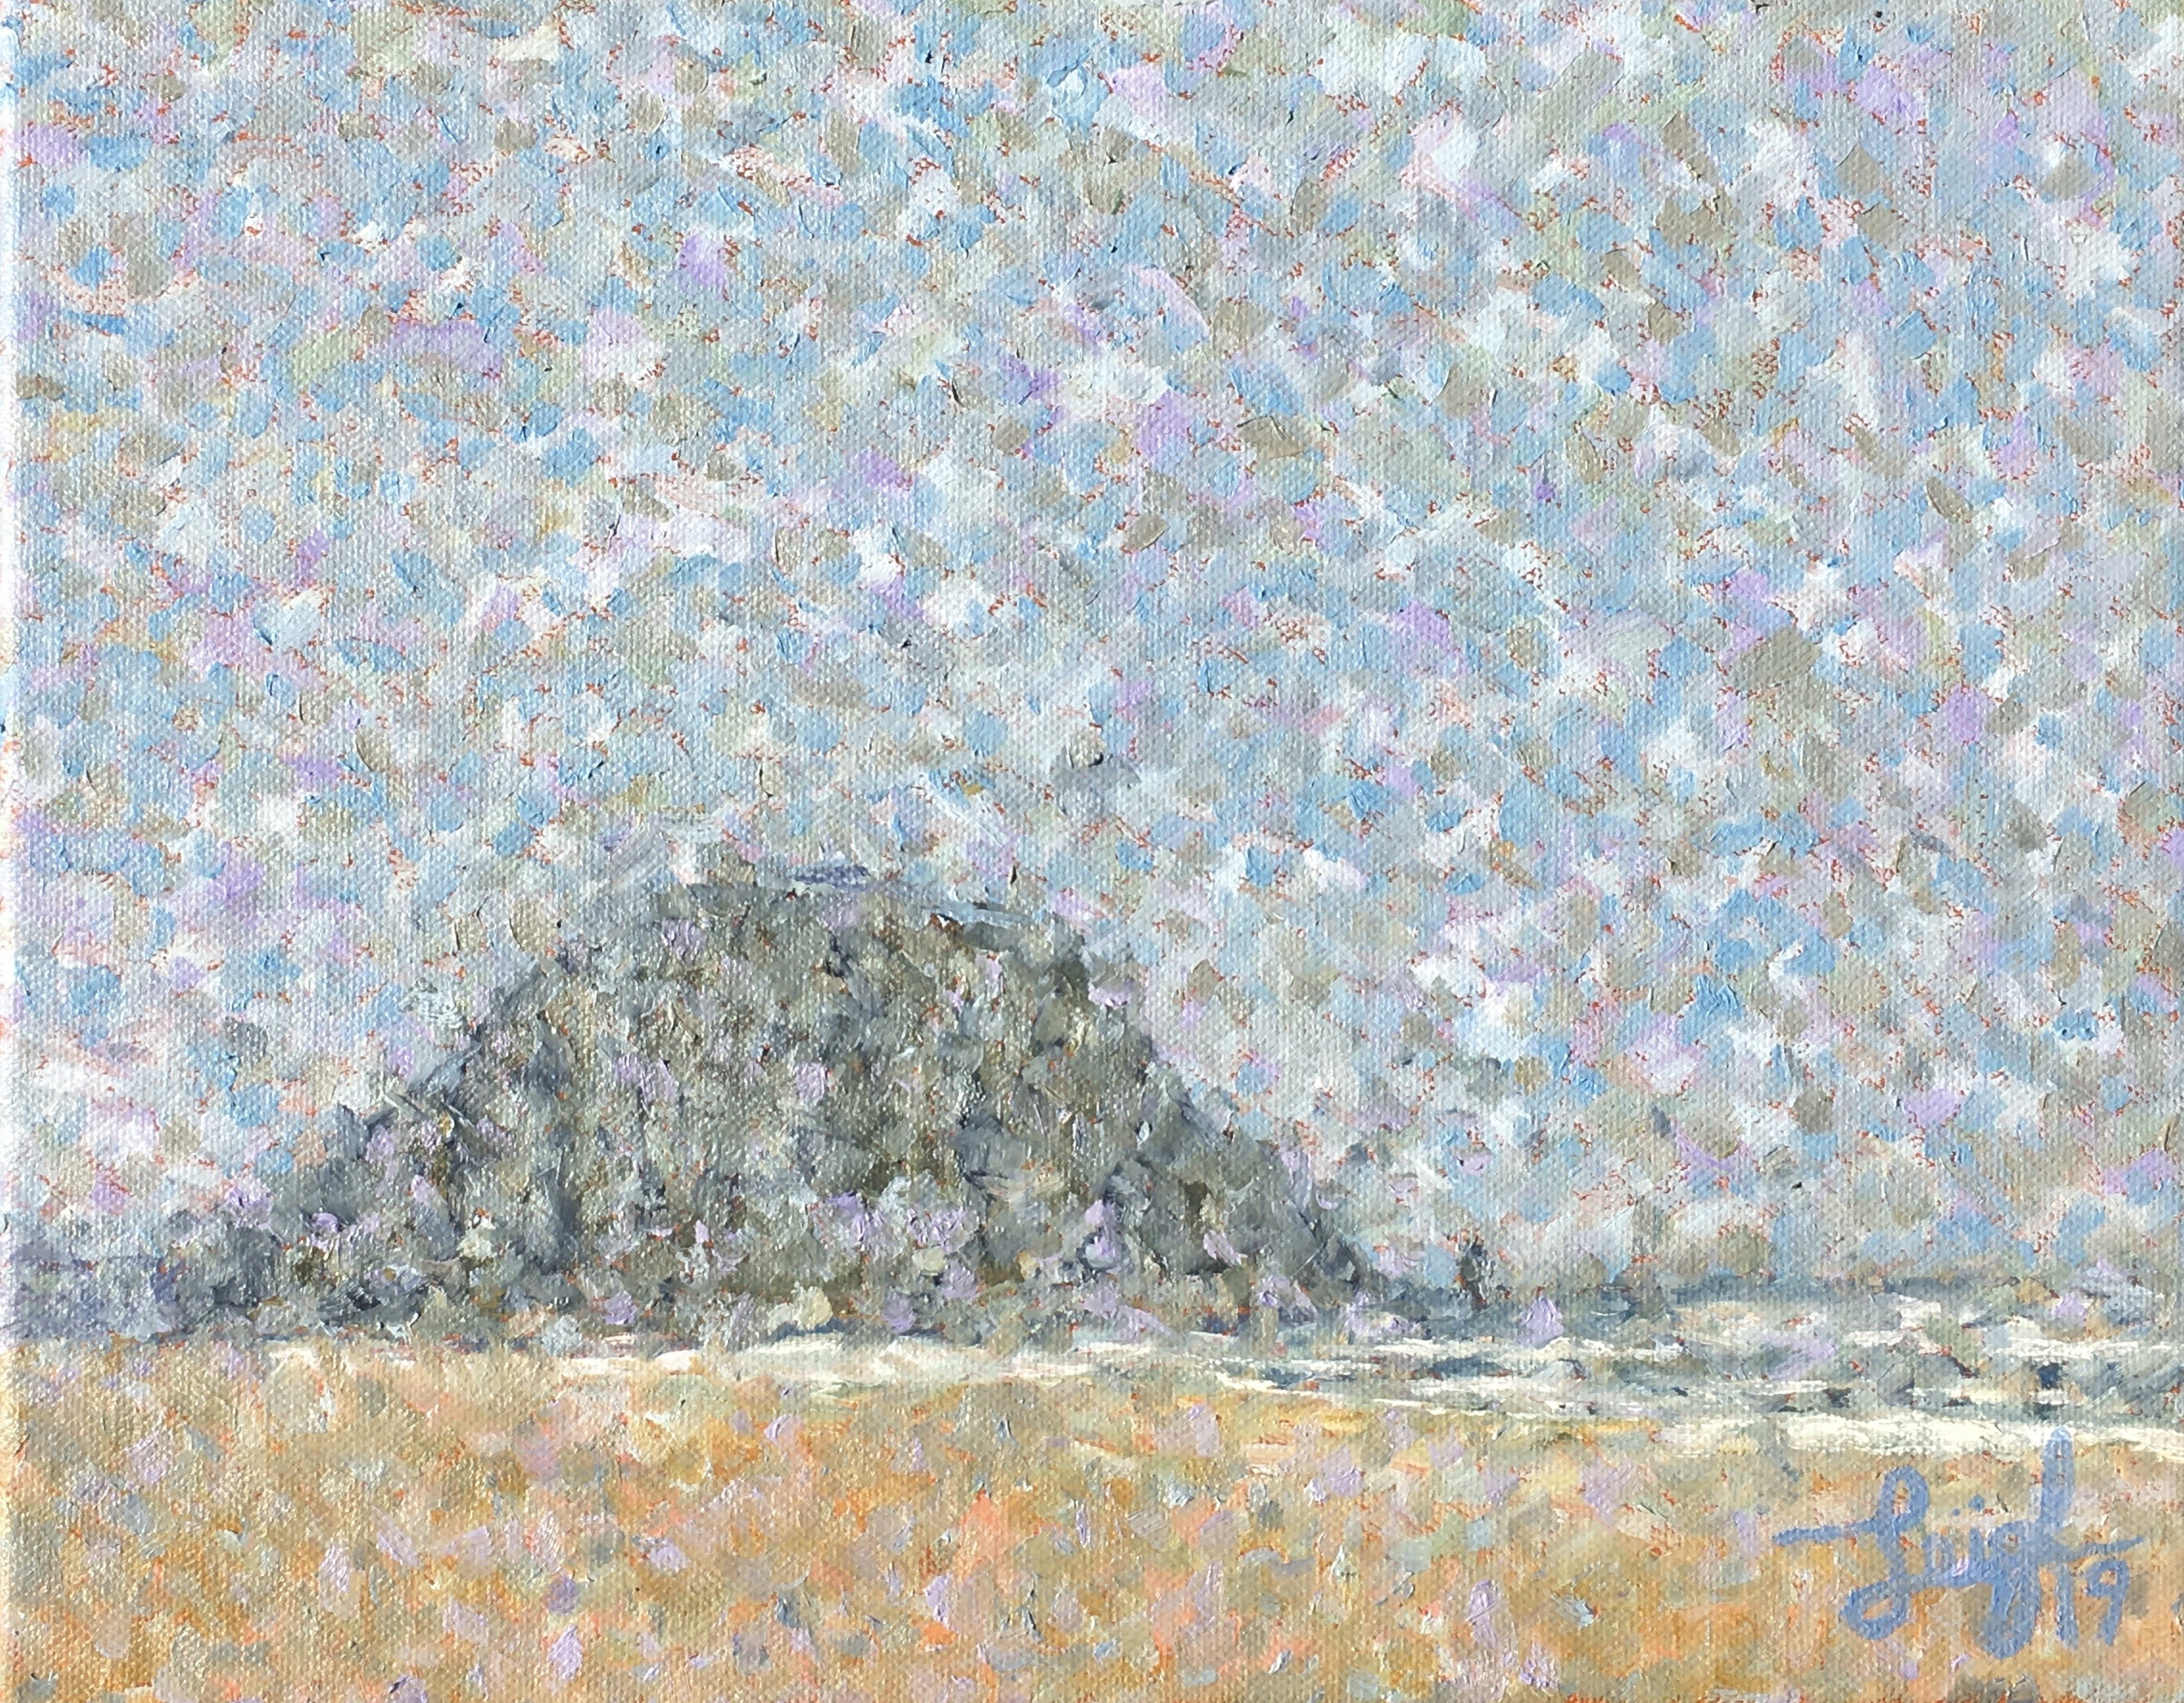 Morro Rock Series #2 (Fog Effect)  ~  Martha Levine, Camp Hill, PA 2019  •  14 x 11